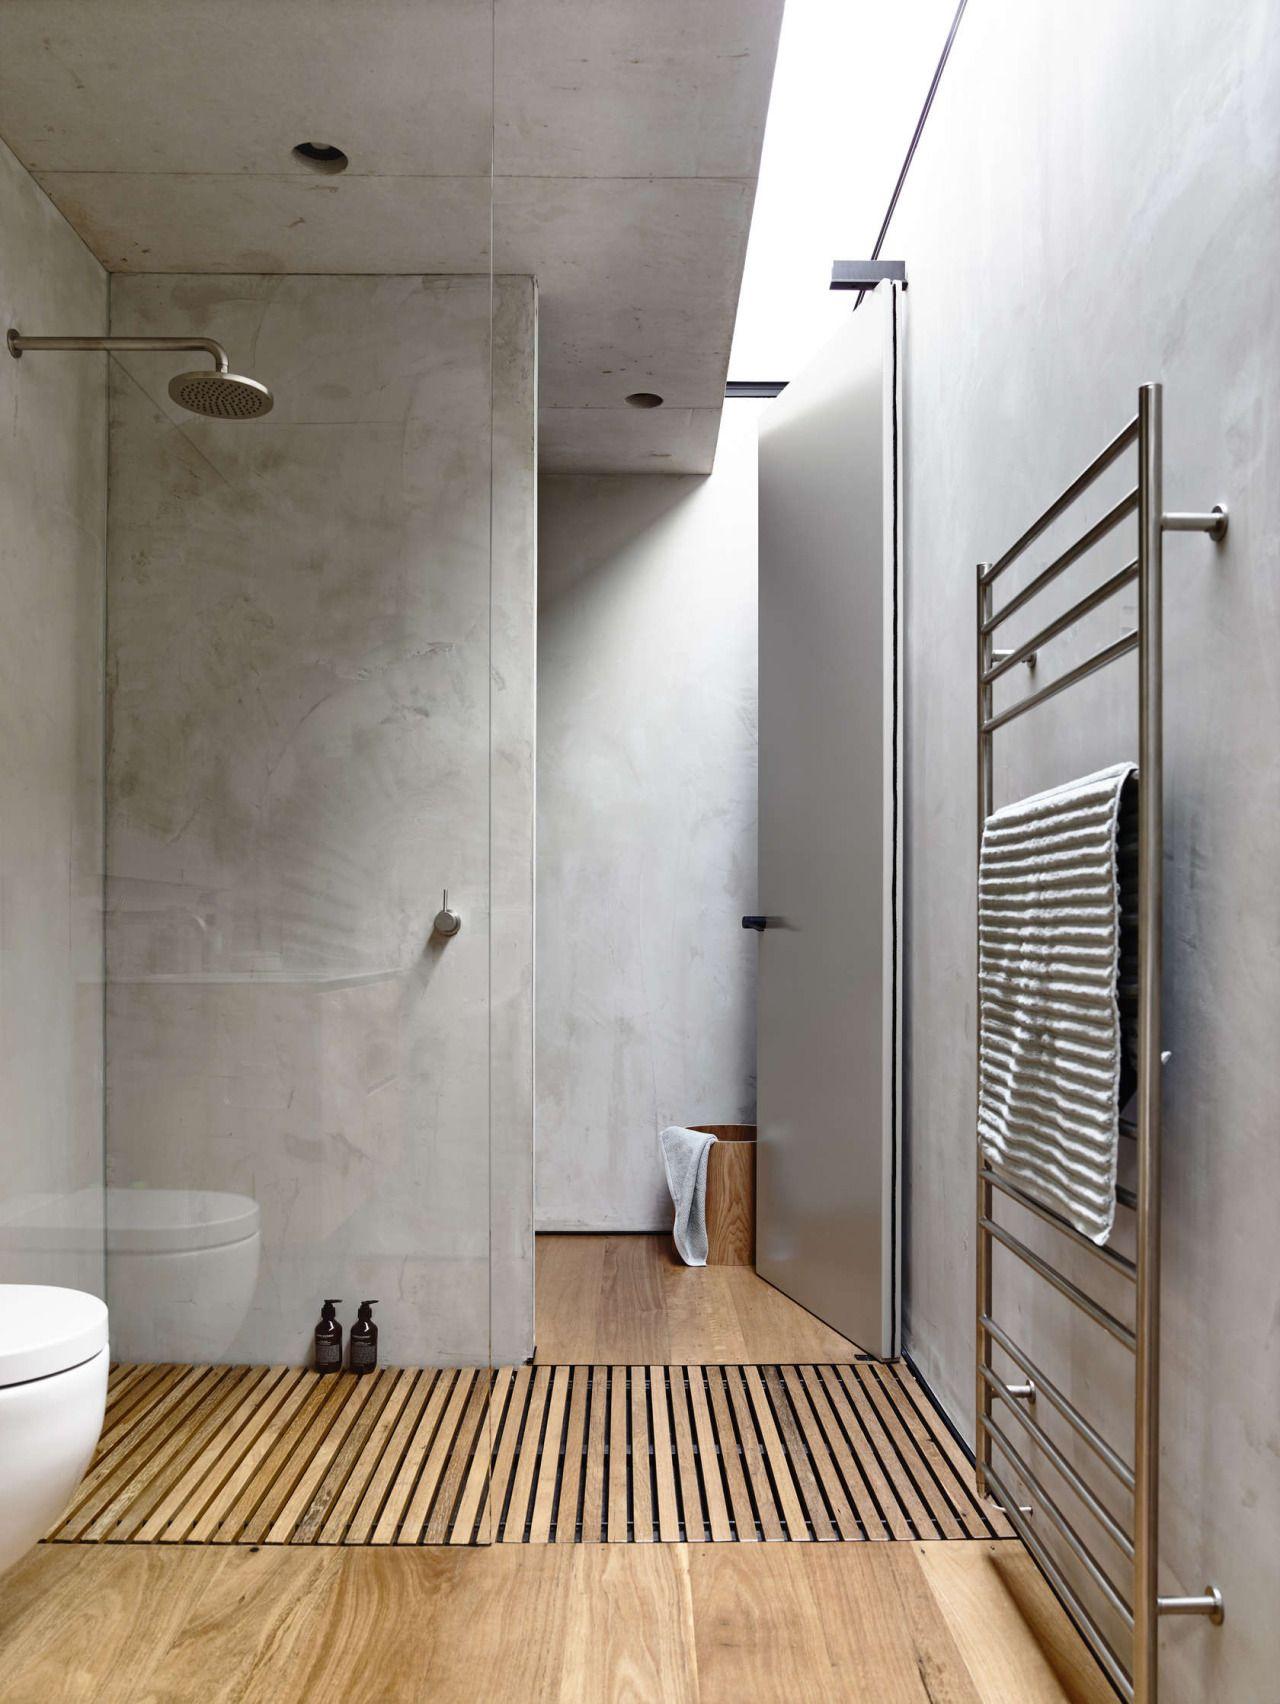 new bathroom images%0A Bathroom designs